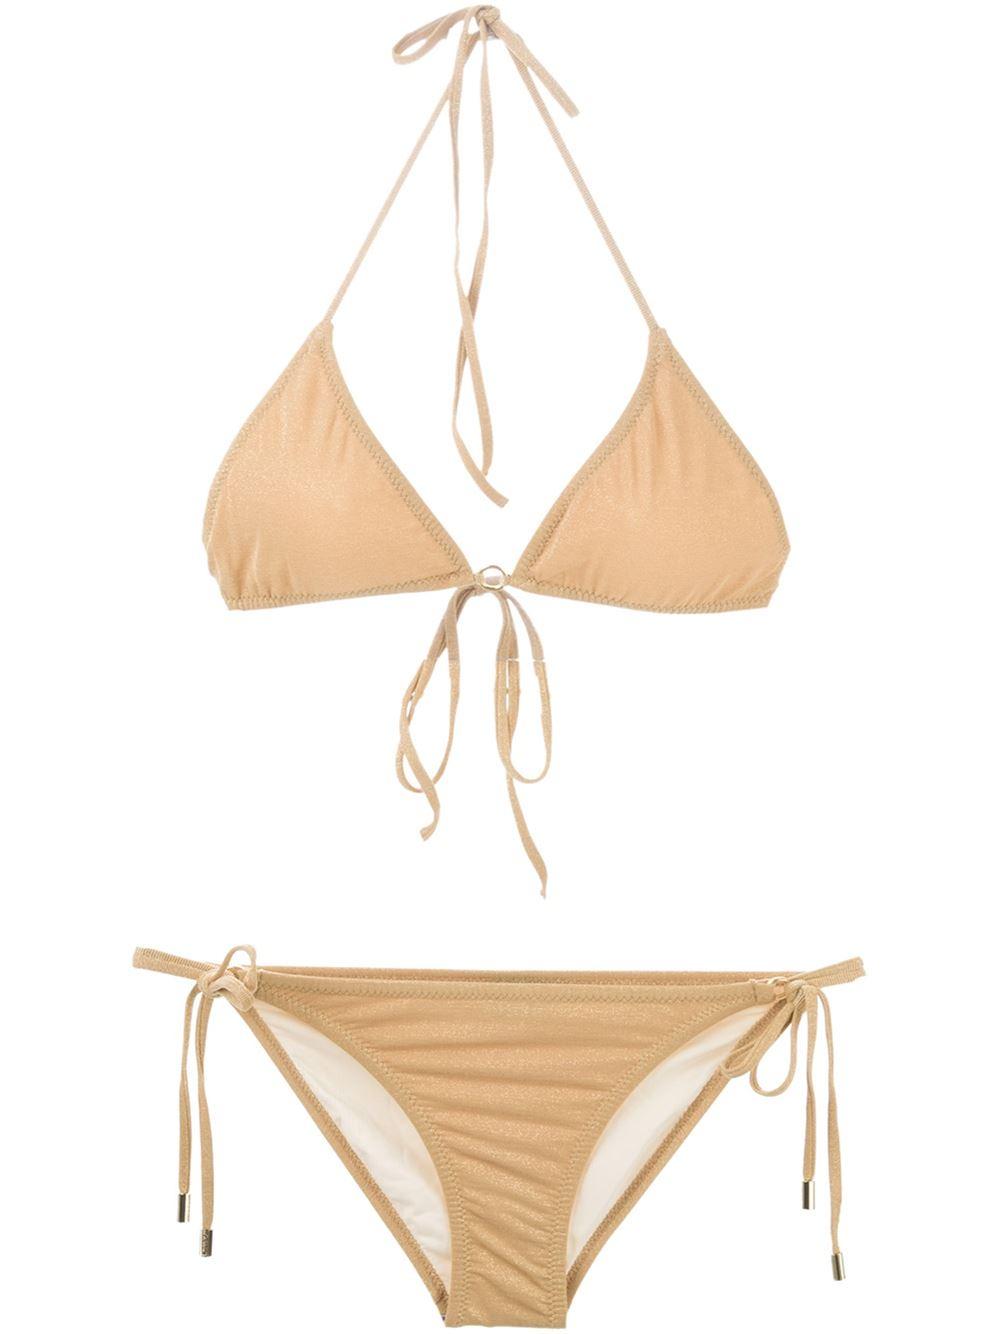 426de98ce1d80 Melissa Odabash Monte Carlo Bikini in Metallic - Lyst